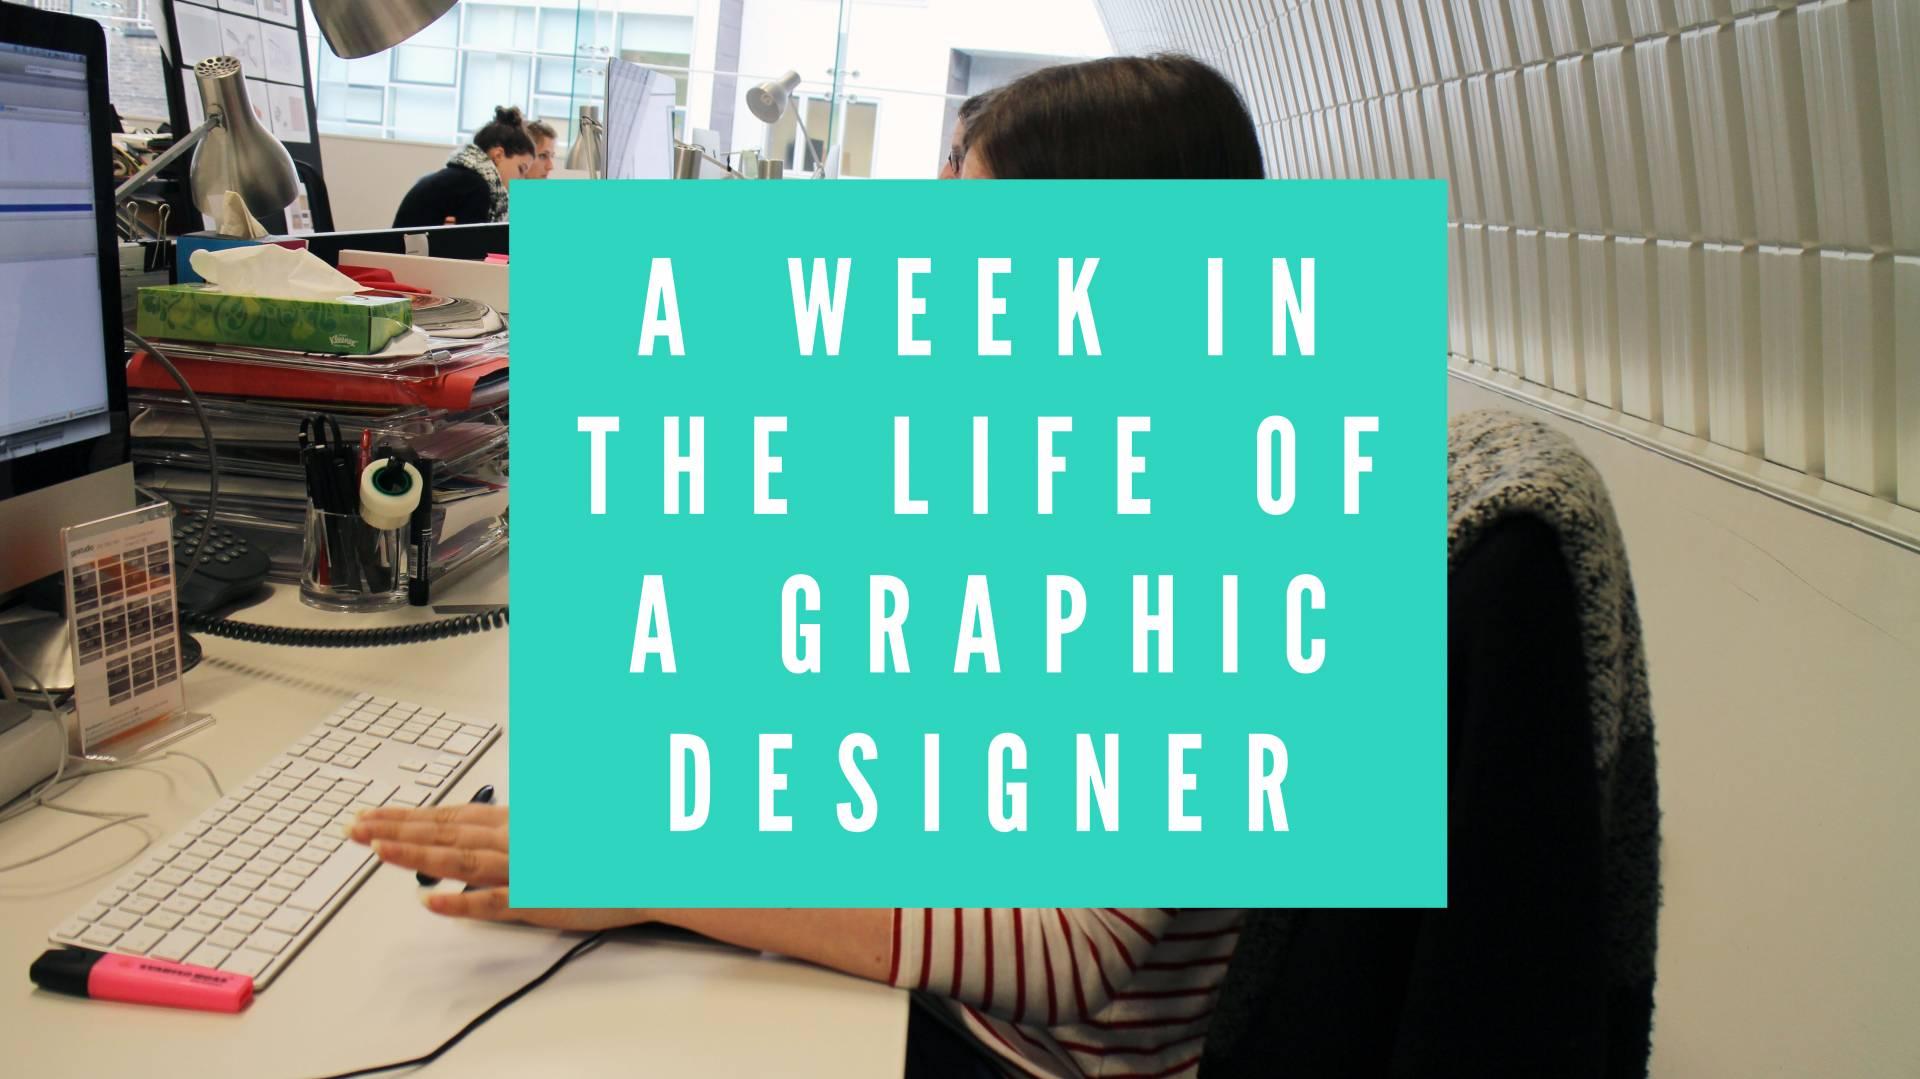 https://graphiquefantastique.com/wp-content/uploads/2016/01/WeekInTheLifeOfAGraphicDesigner.jpg